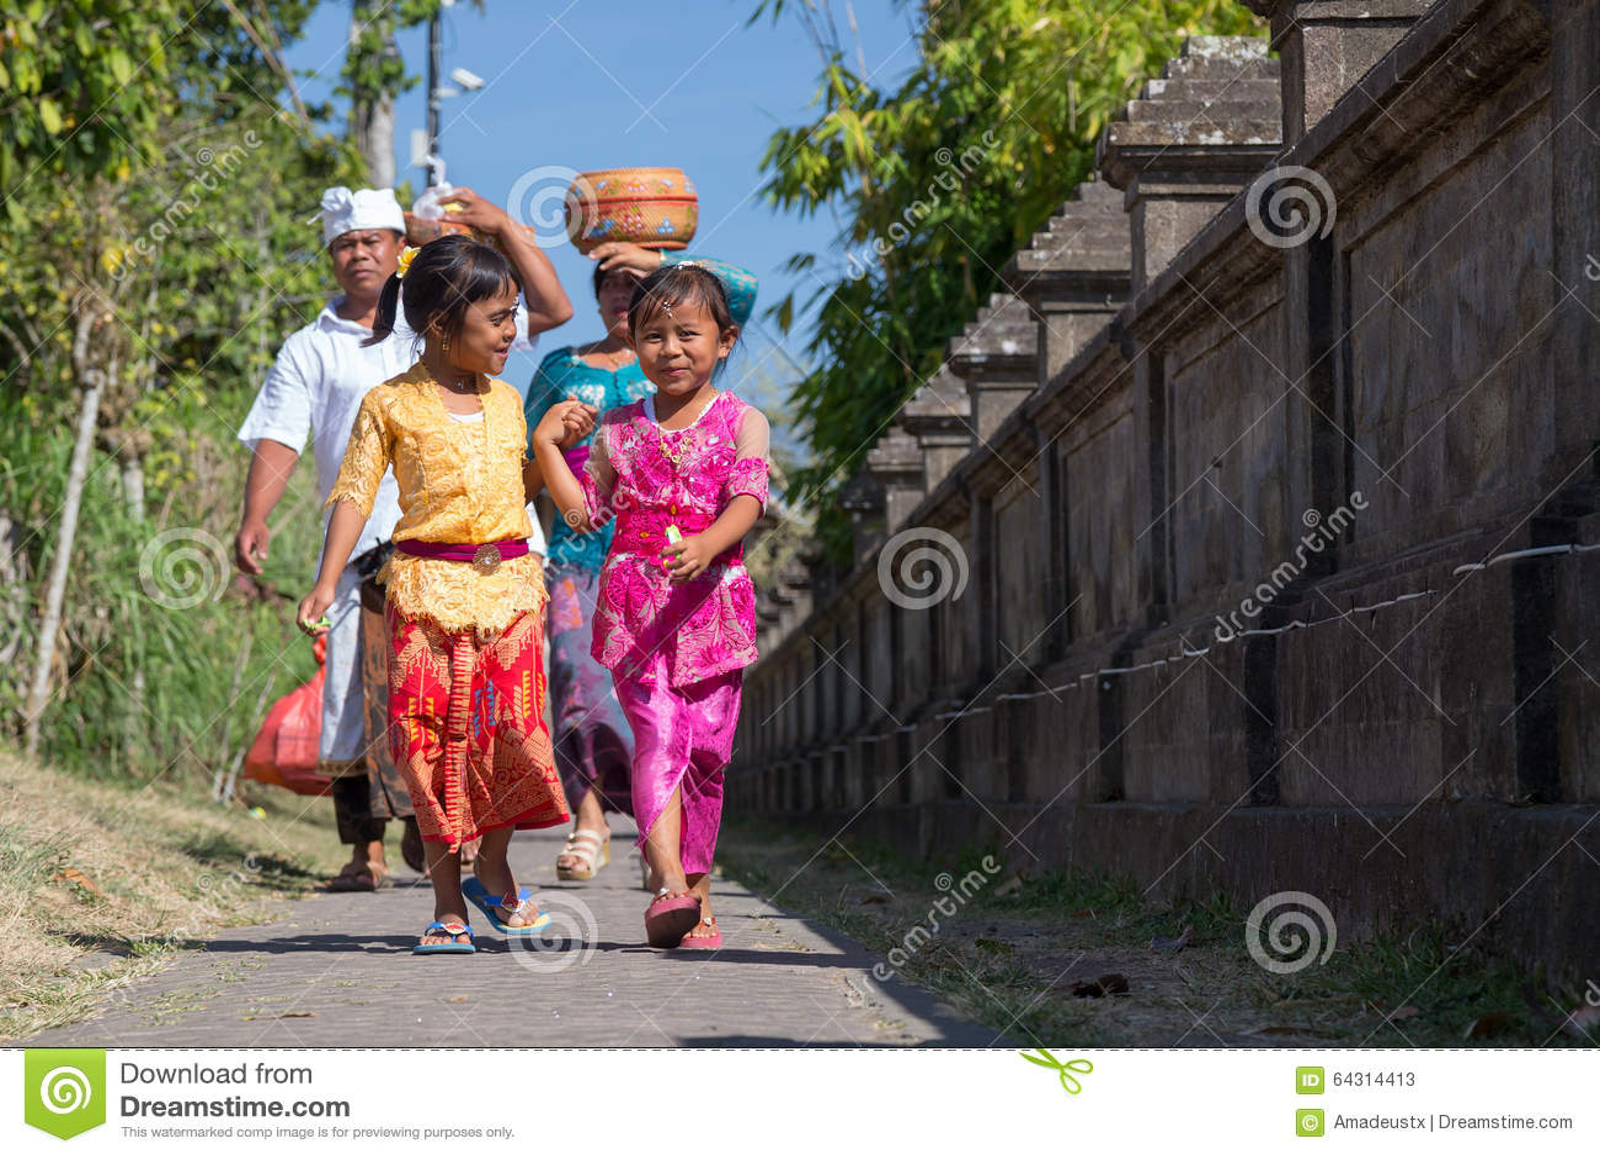 Village de Besakih, Bali/Indonésie - vers en octobre 2015 : La famille heureuse reviennent du festival en Pura Besakih